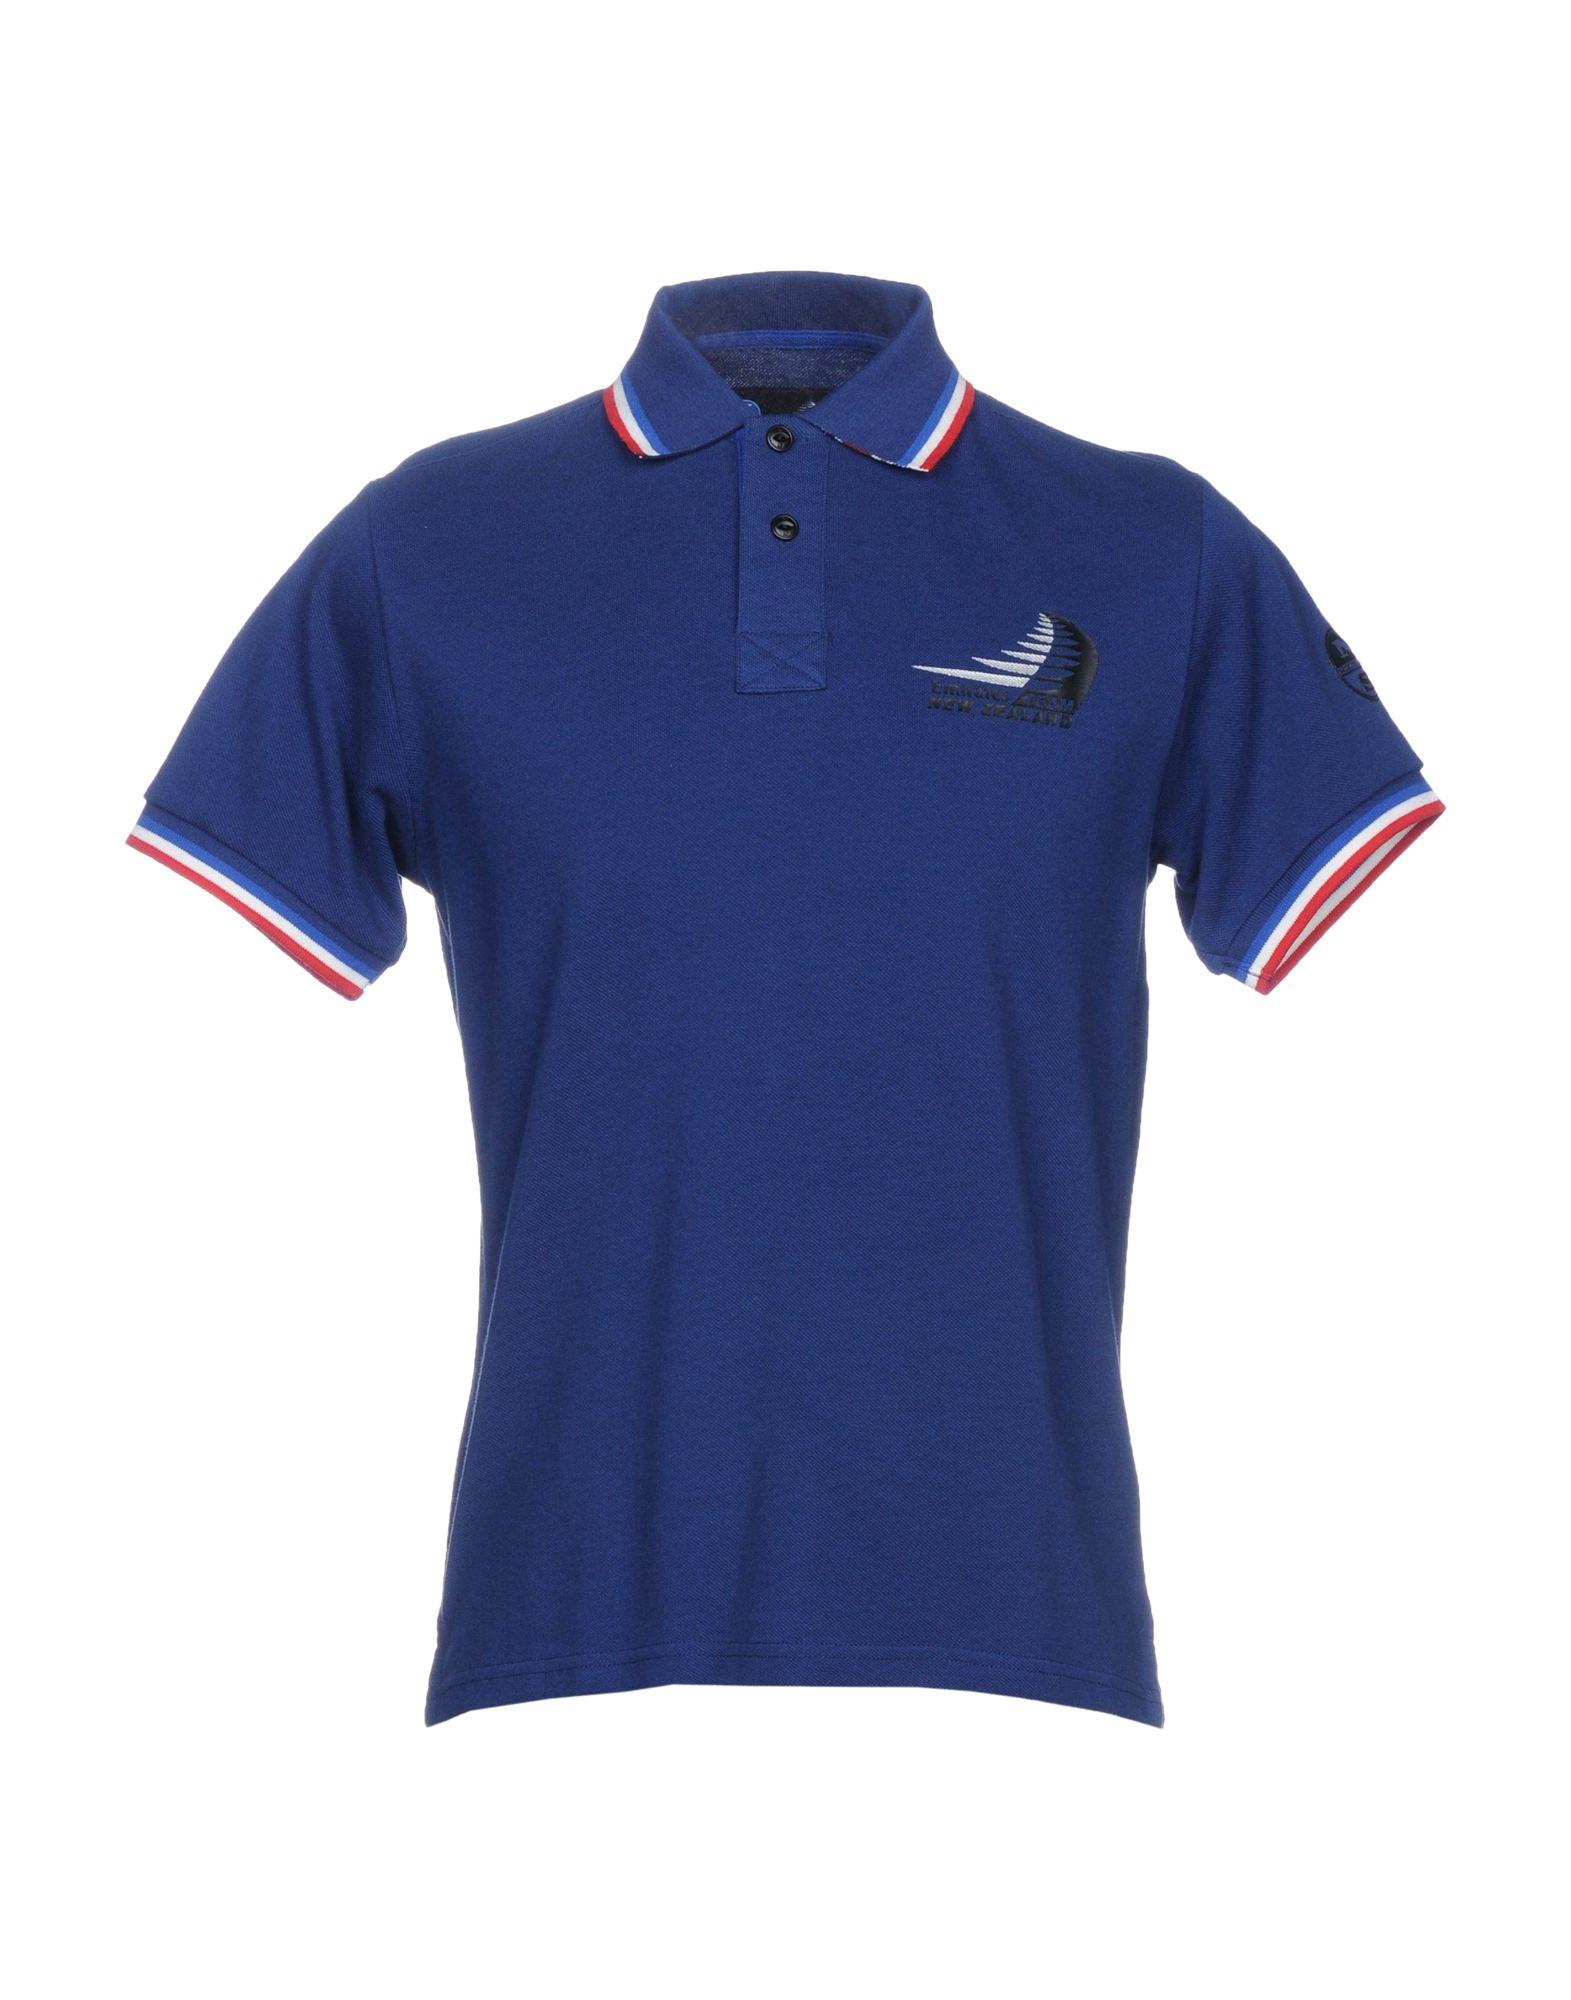 NORTH SAILS Polo Shirt in Dark Blue